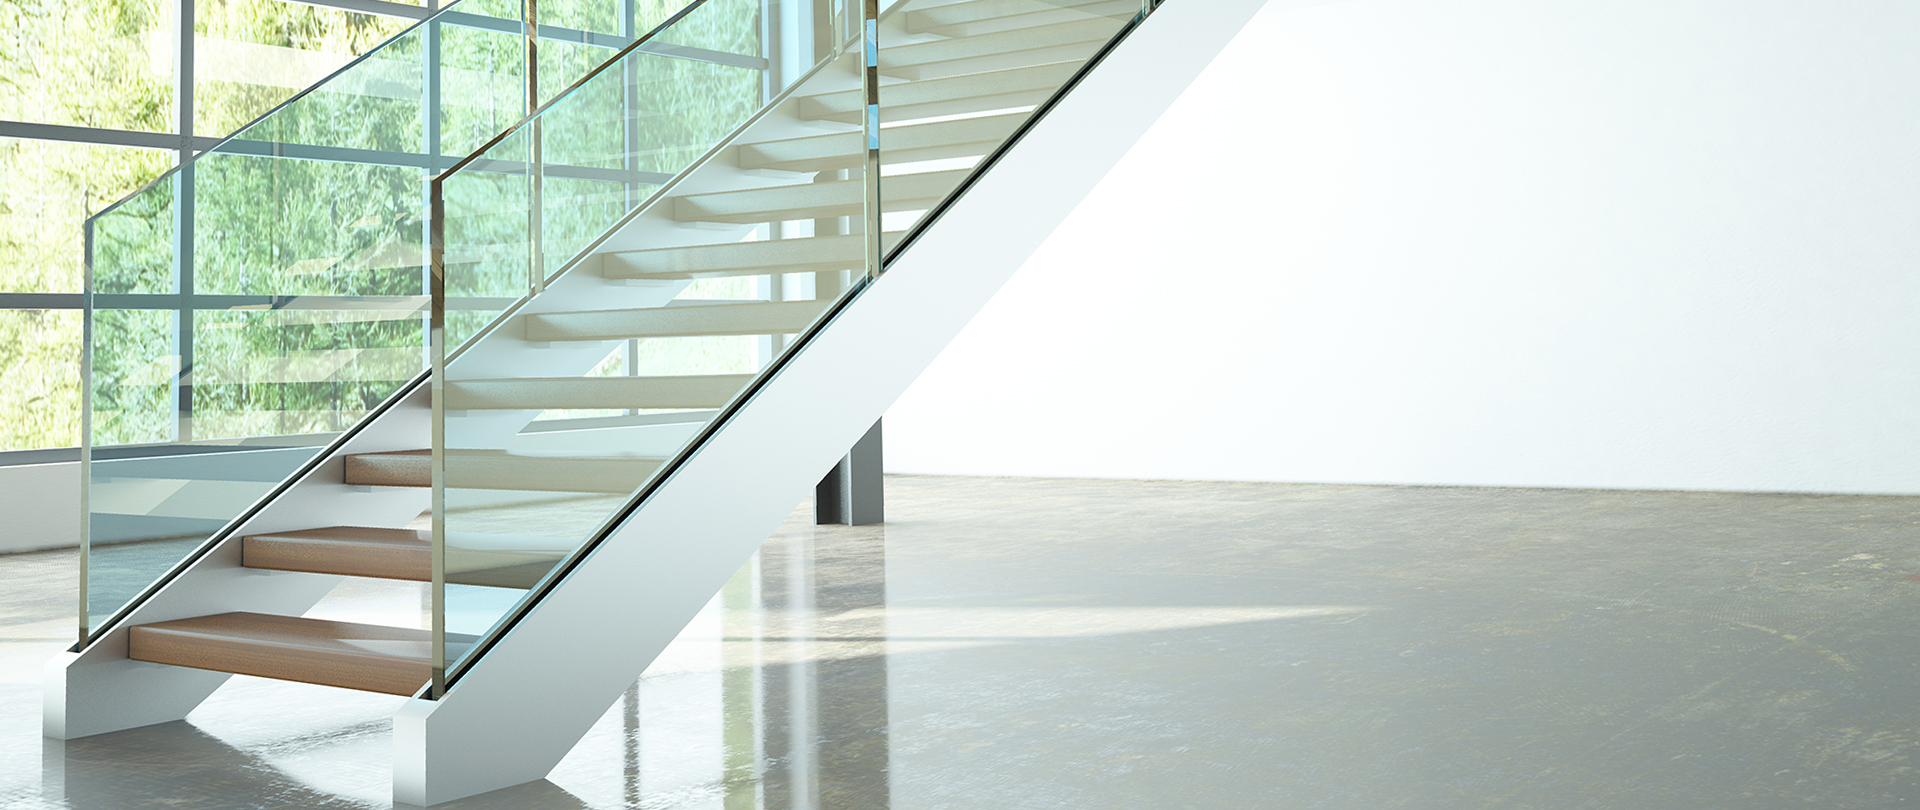 realisation-resine-polyurethane-autolissante-effet-beton-conception-carrelage-saintais-CS17